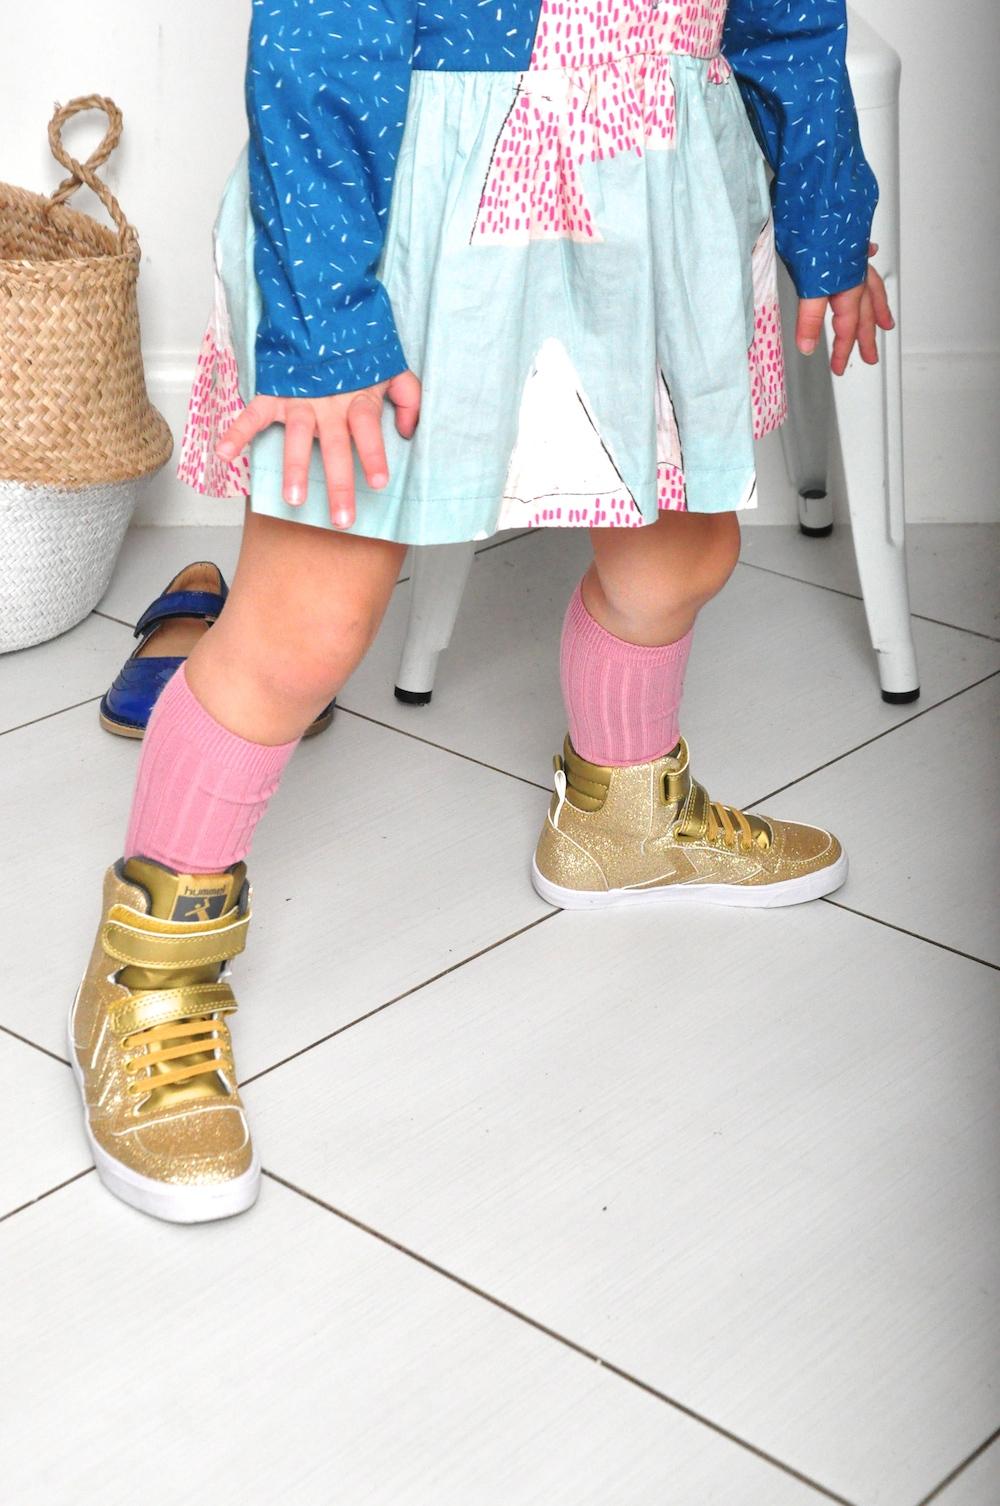 HUmmel_kidsen_shoes_discoutnt_milk_and_biscuits